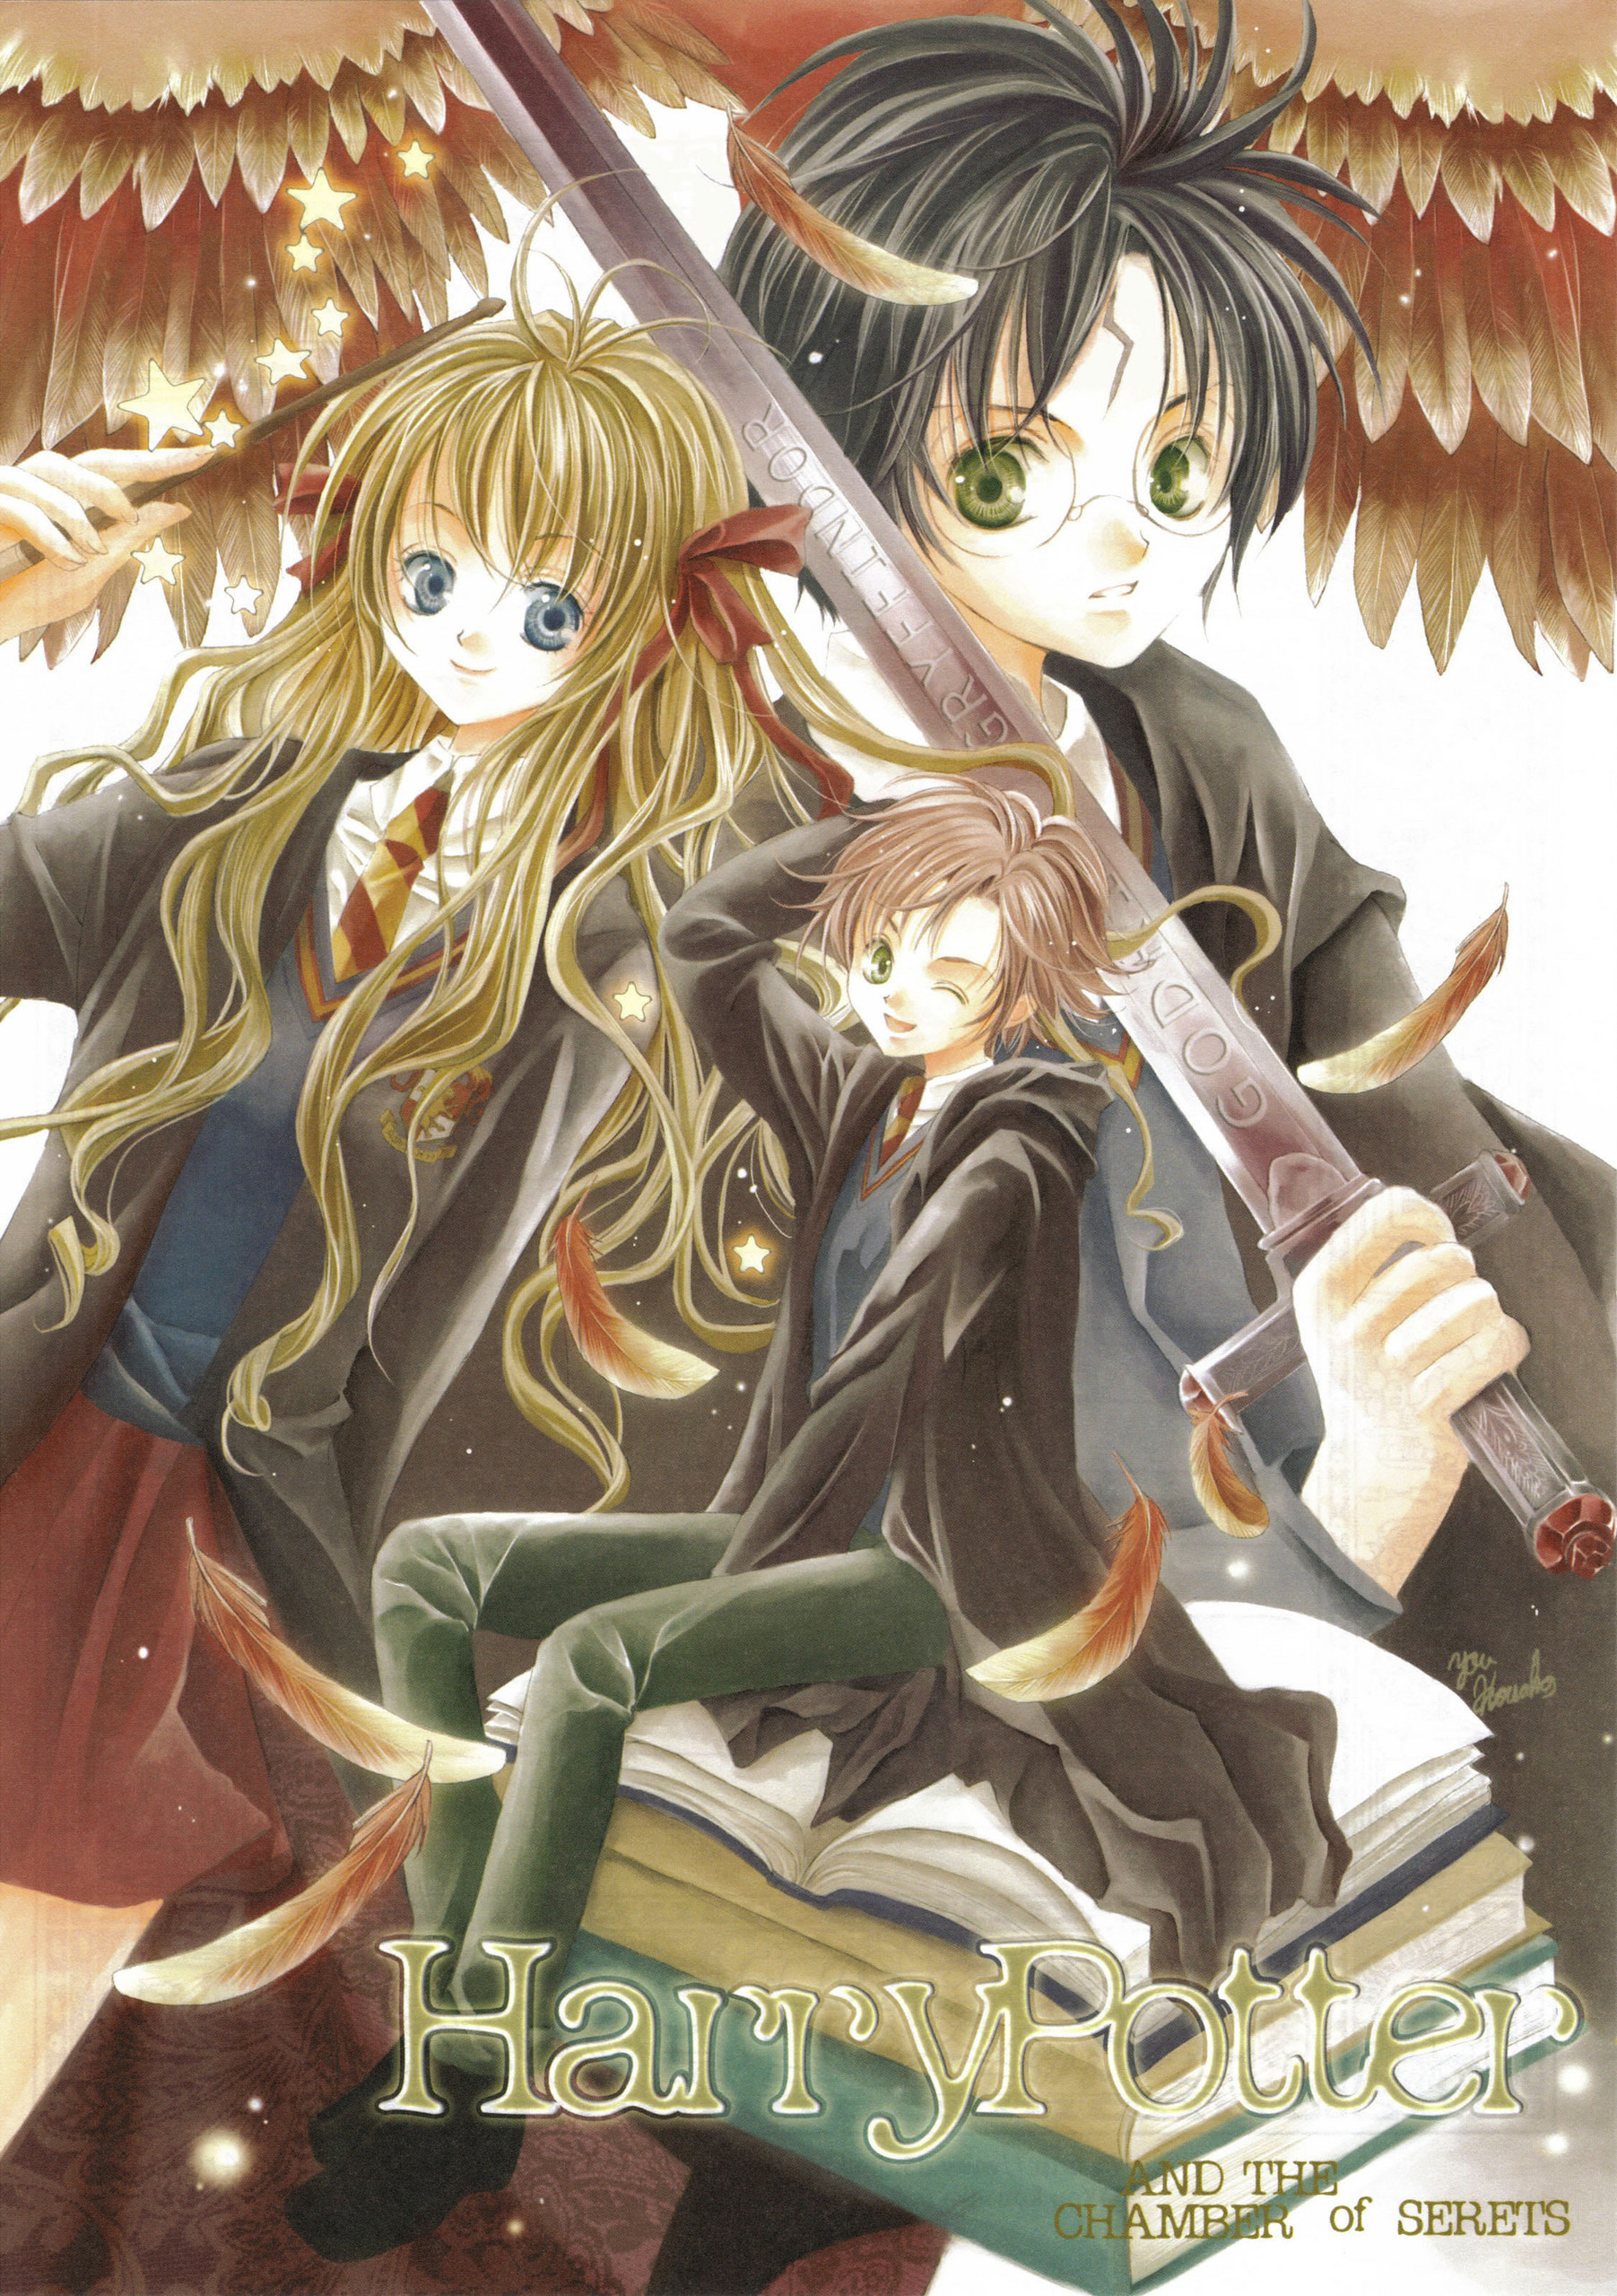 Harry Potter anime [Megapost] Harry-Potter-Anime-funkyrach01-18685148-1803-2560